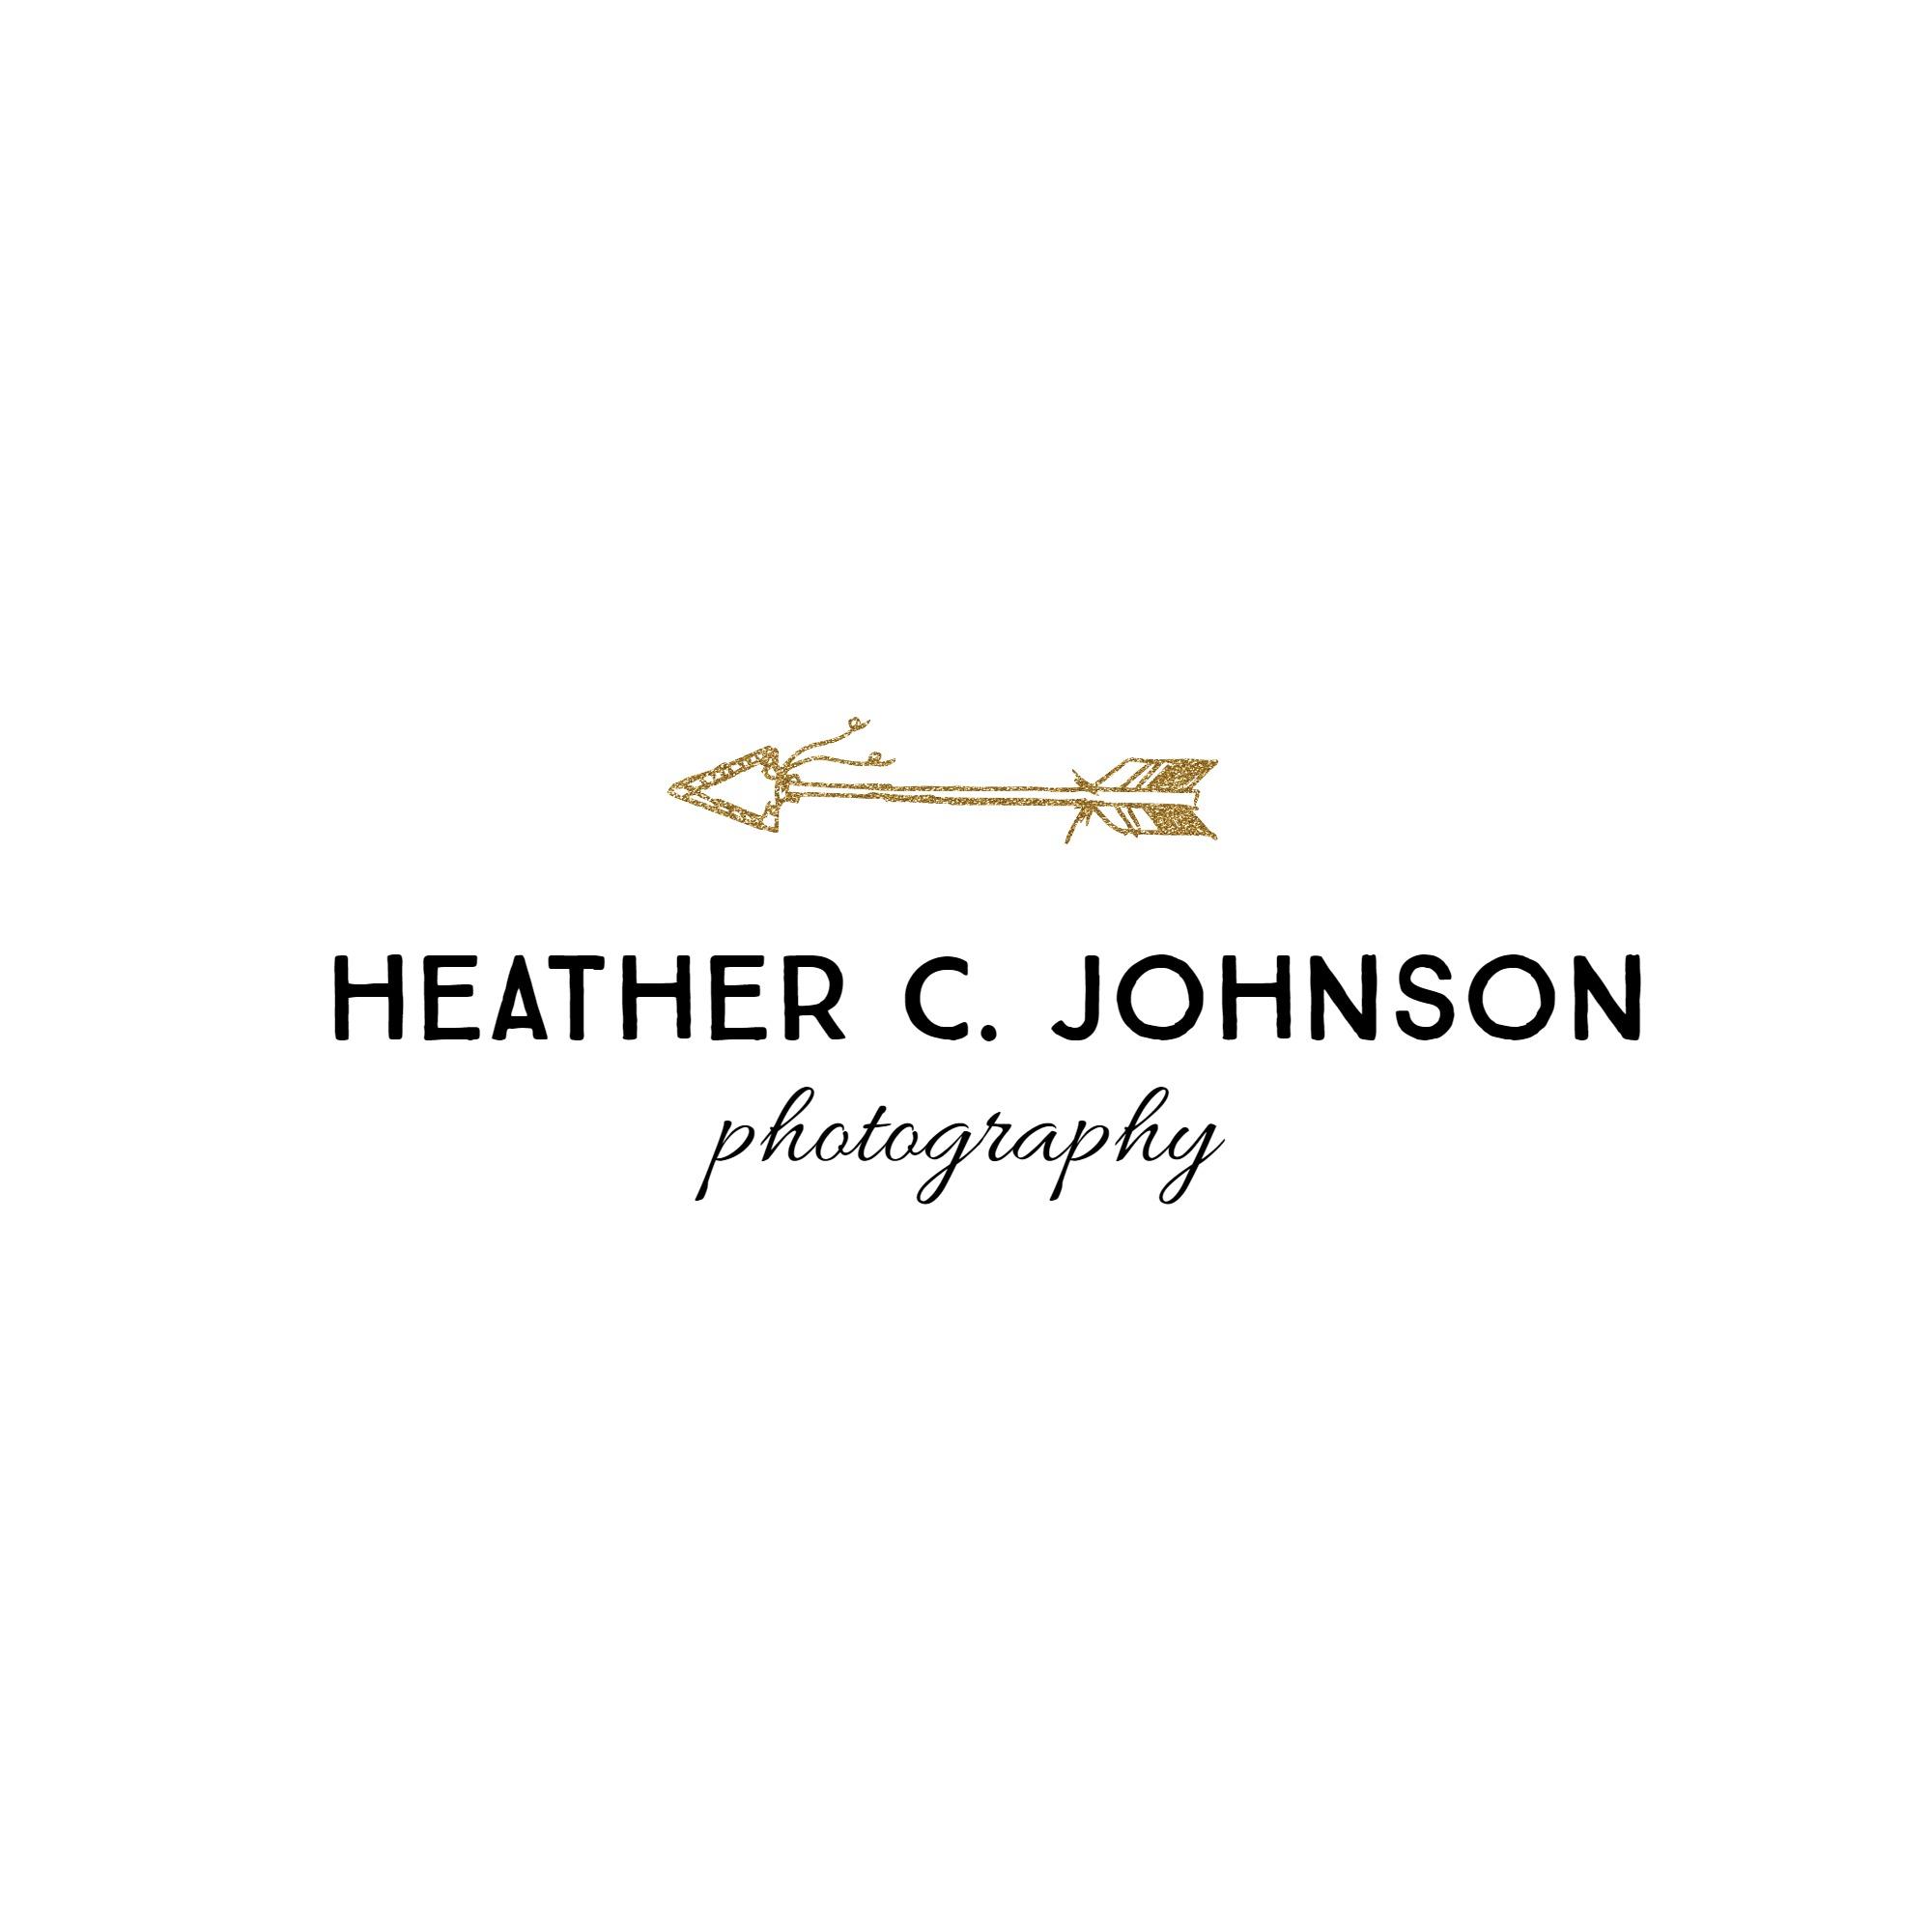 Heather C. Johnson Photography